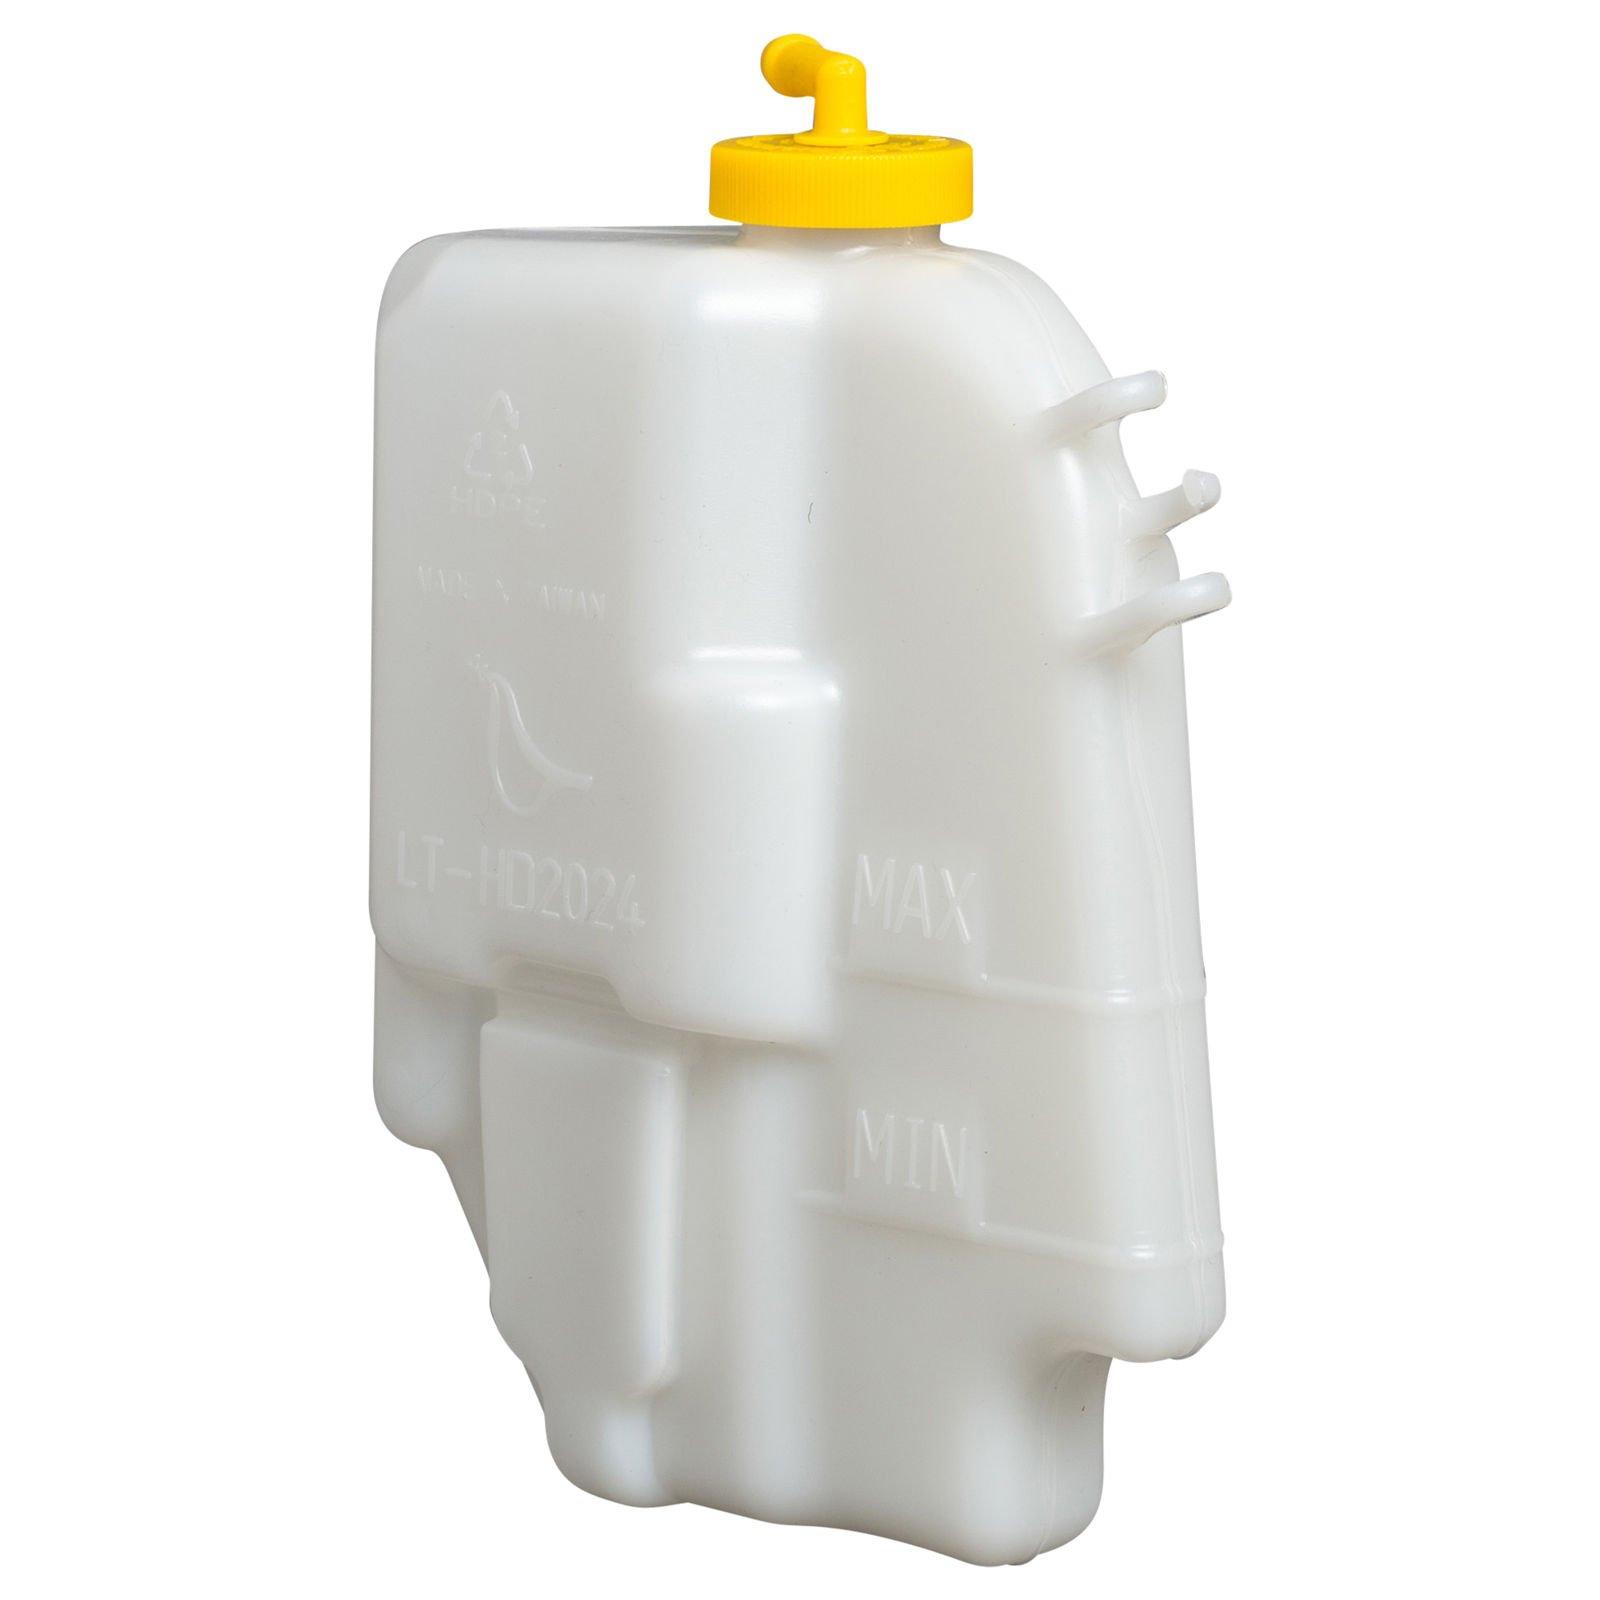 Coolant Tank Reservoir for 06-11 Honda Civic Acura CSX fit HO3014115 19101RNAA01 Parts Galaxy